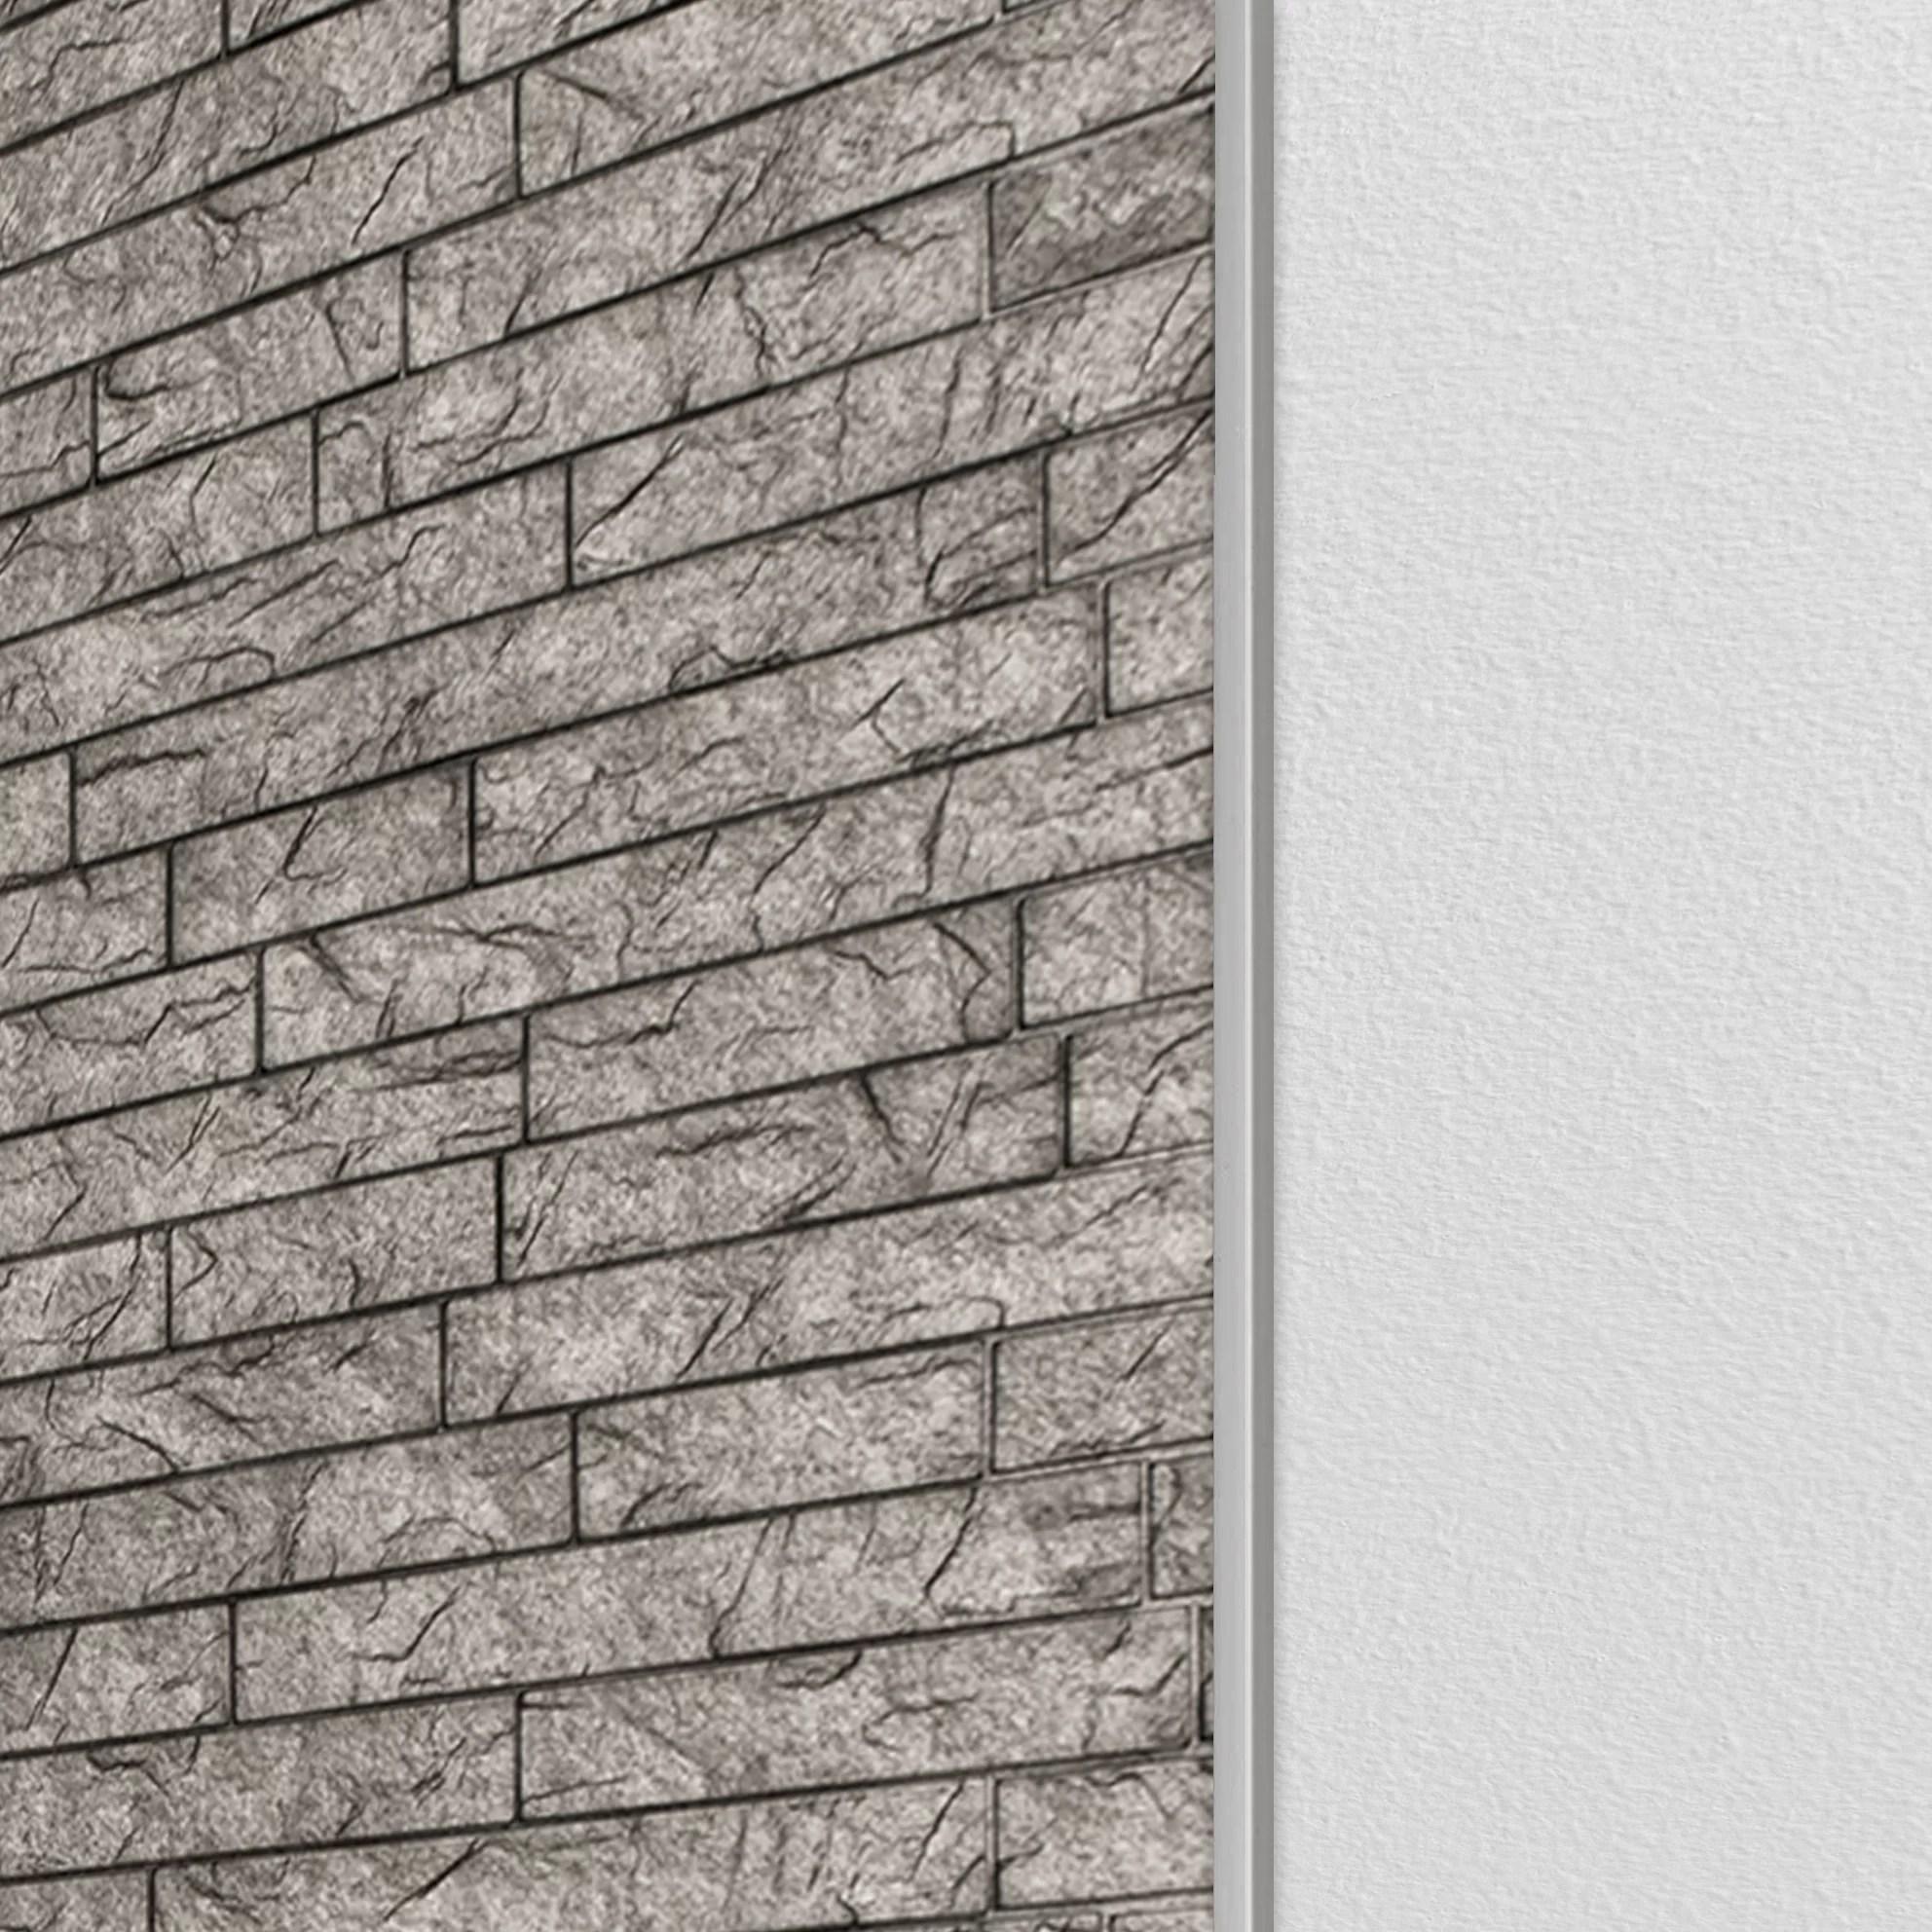 48 x 0 1 matte metal edge trim tile trim in silver